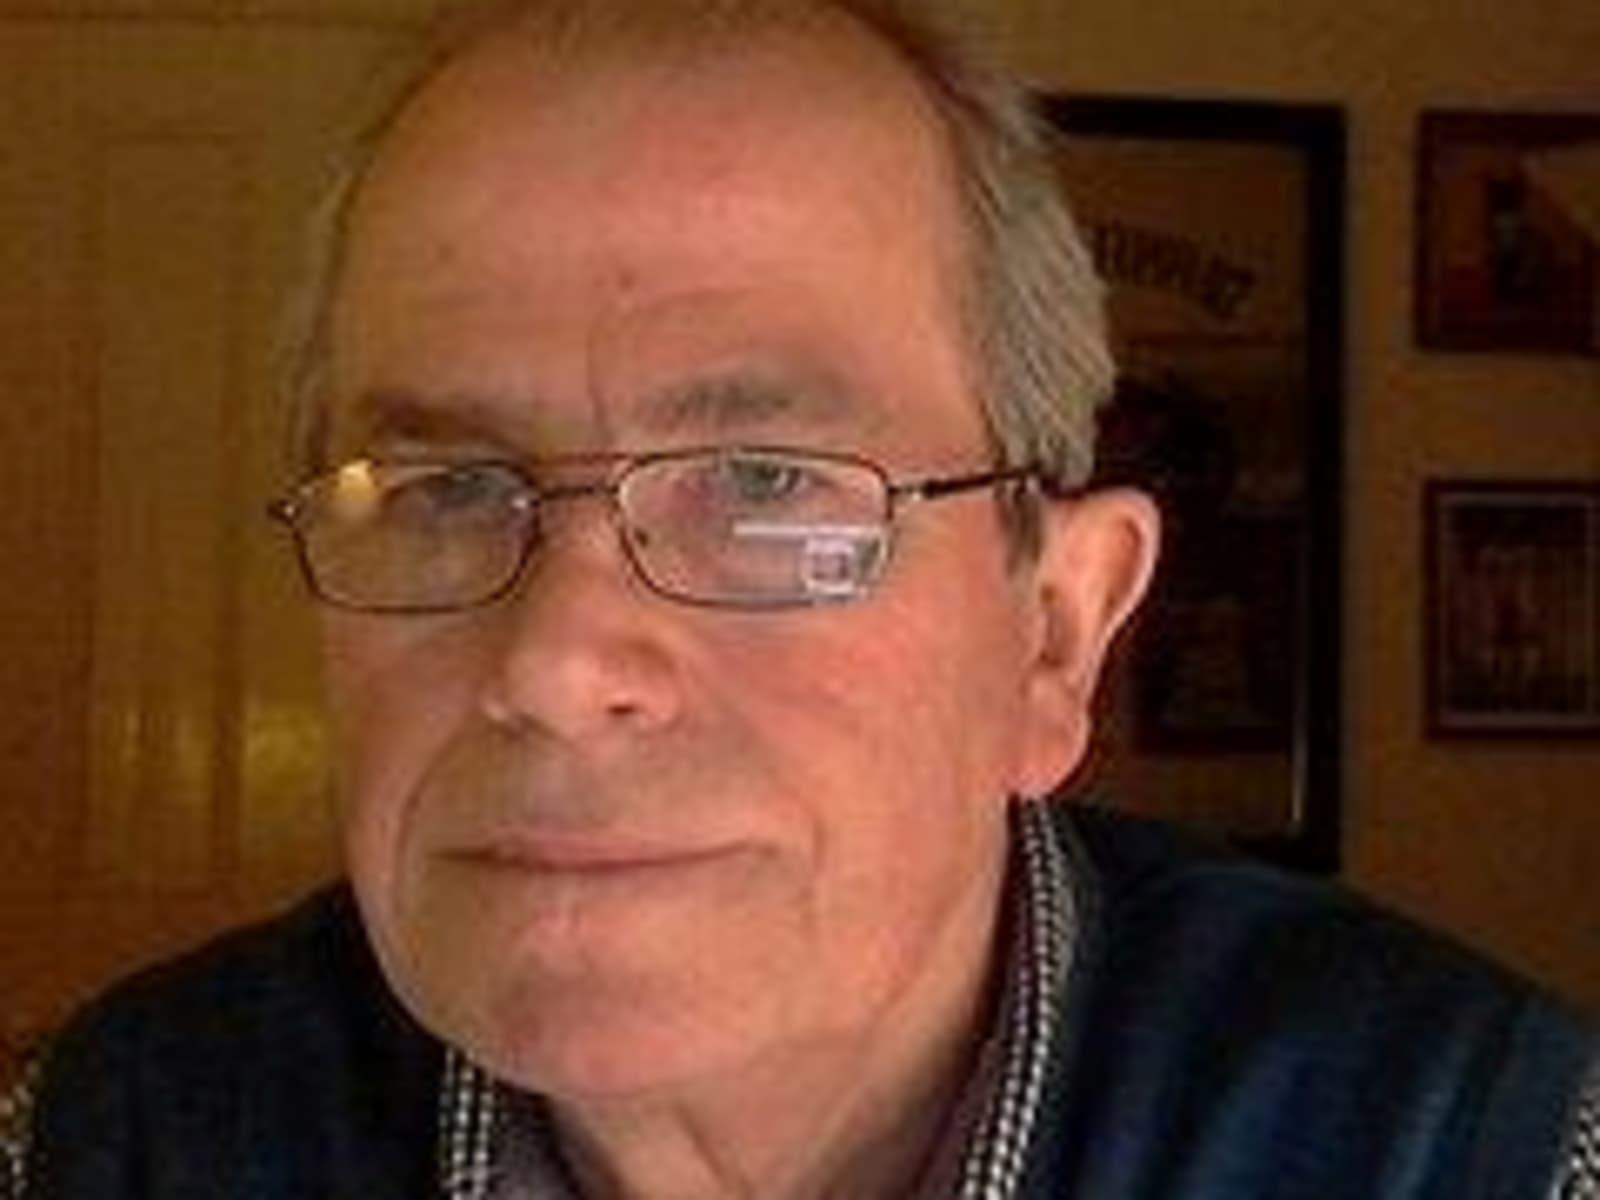 James from Doncaster, United Kingdom